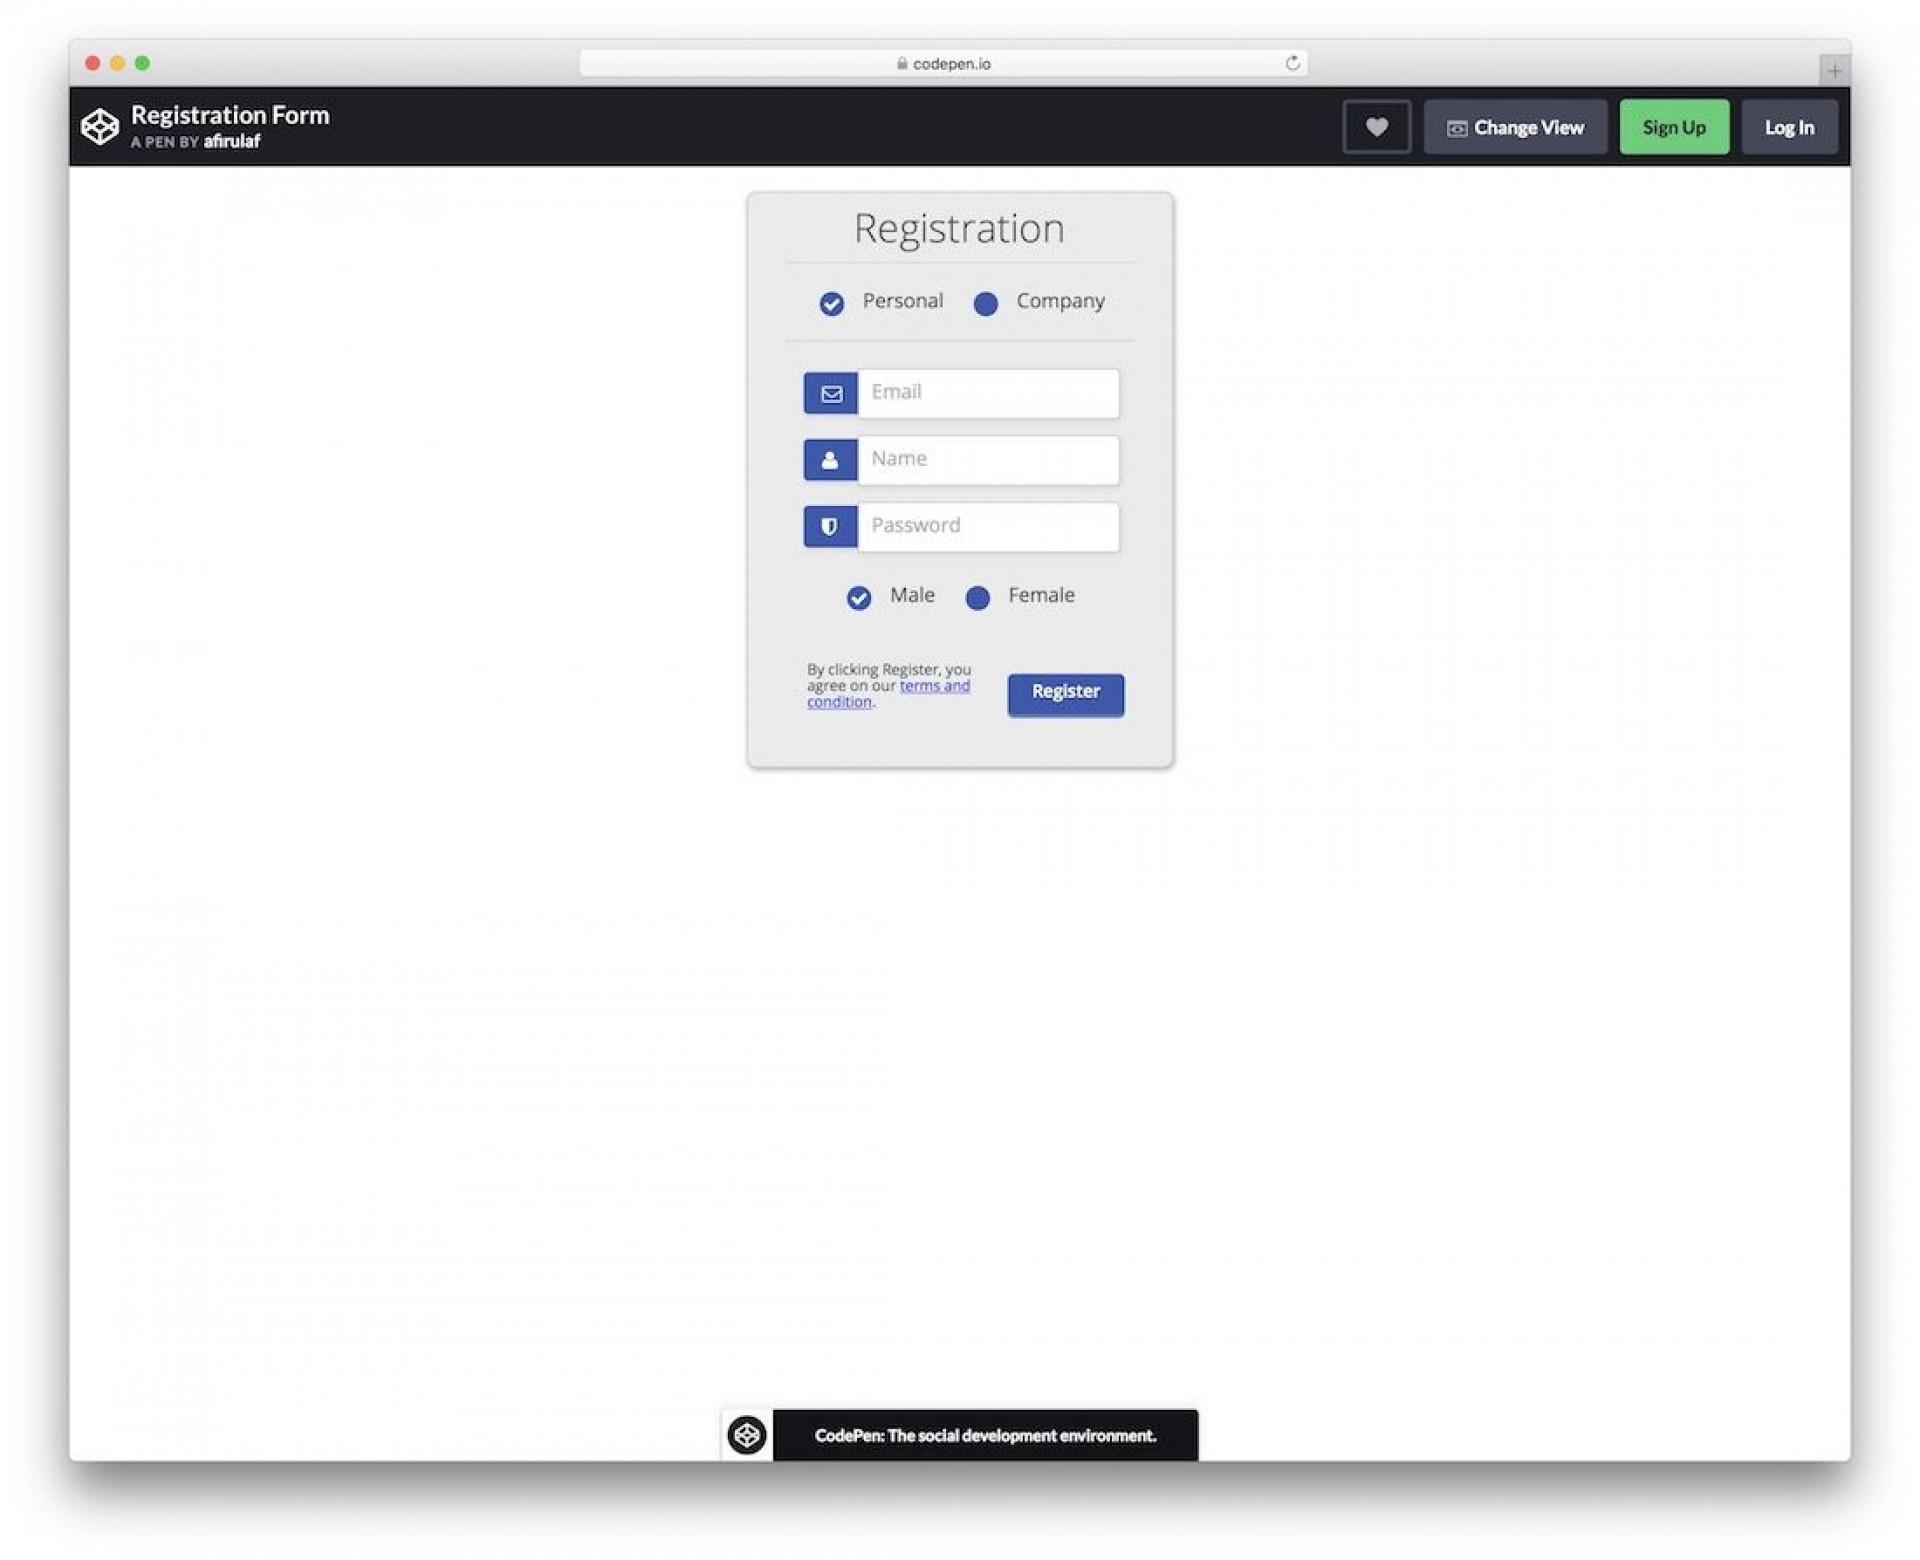 010 Simple Registration Form Template Free Sample  Printable Event1920